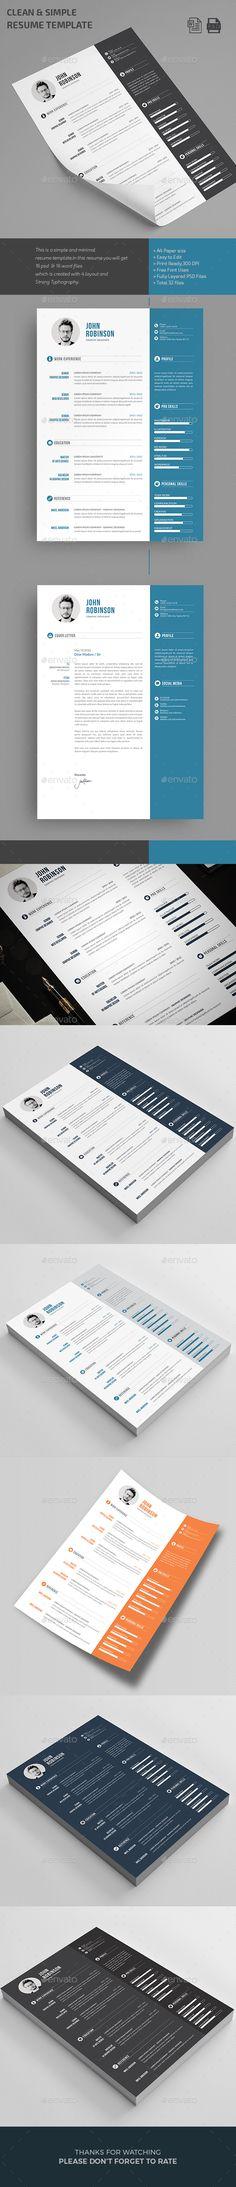 Resume   CV Resume cv, Cv template and Modern resume - resume paper size